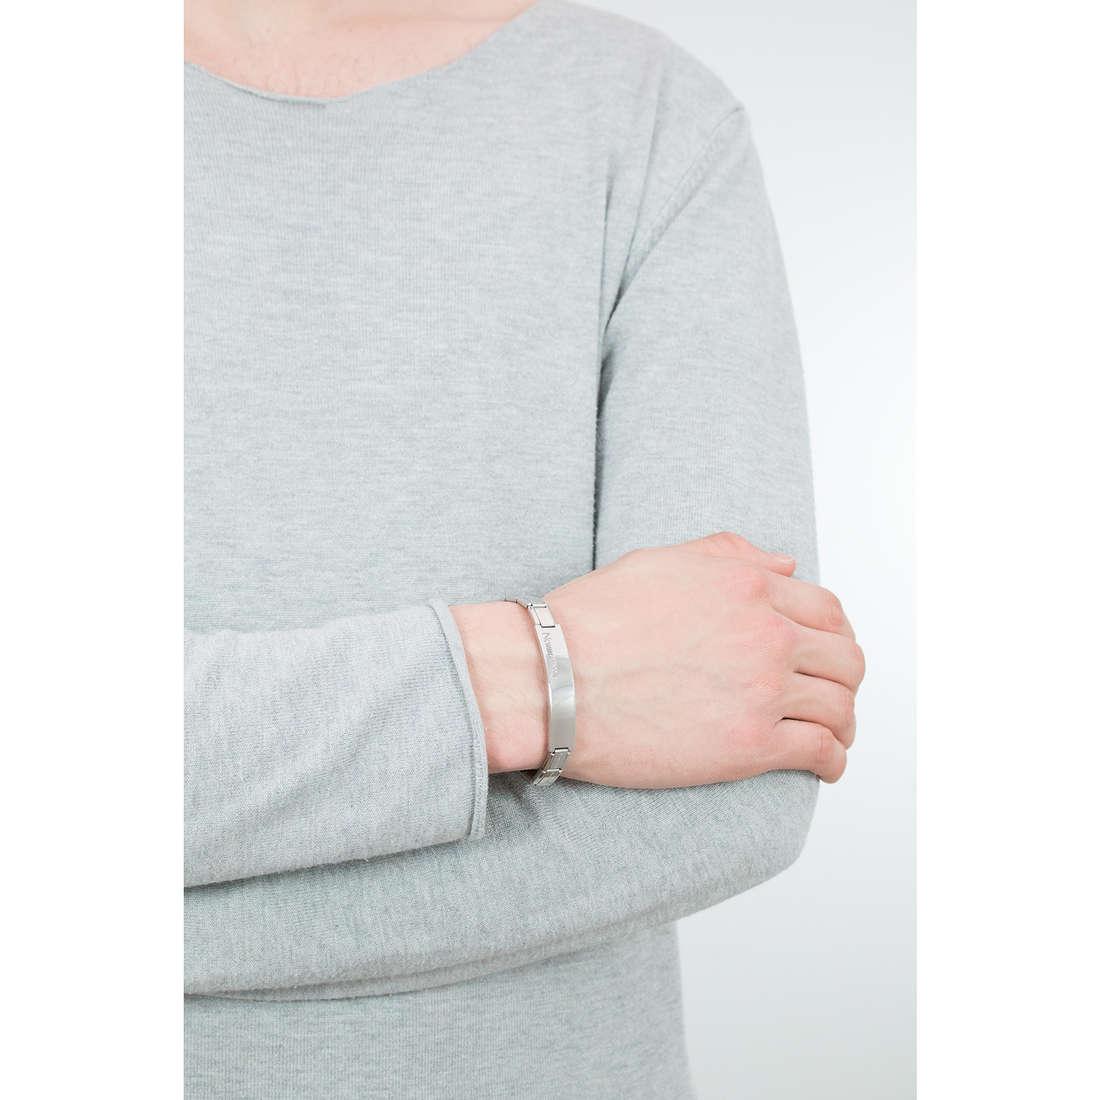 Nomination bracciali Trendsetter uomo 021106/004 indosso